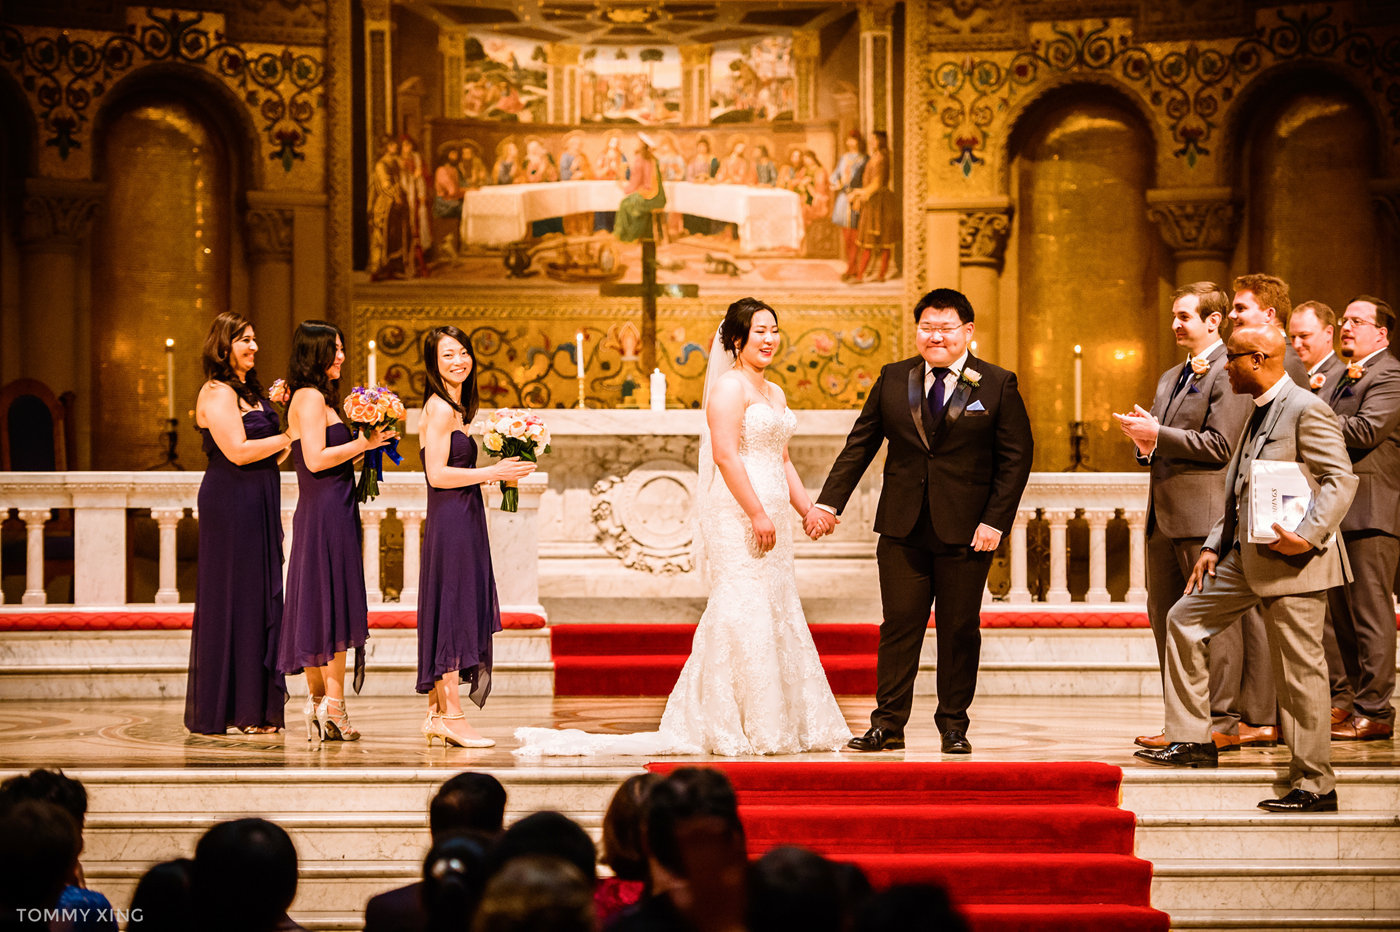 STANFORD MEMORIAL CHURCH WEDDING - Wenjie & Chengcheng - SAN FRANCISCO BAY AREA 斯坦福教堂婚礼跟拍 - 洛杉矶婚礼婚纱照摄影师 Tommy Xing Photography112.jpg